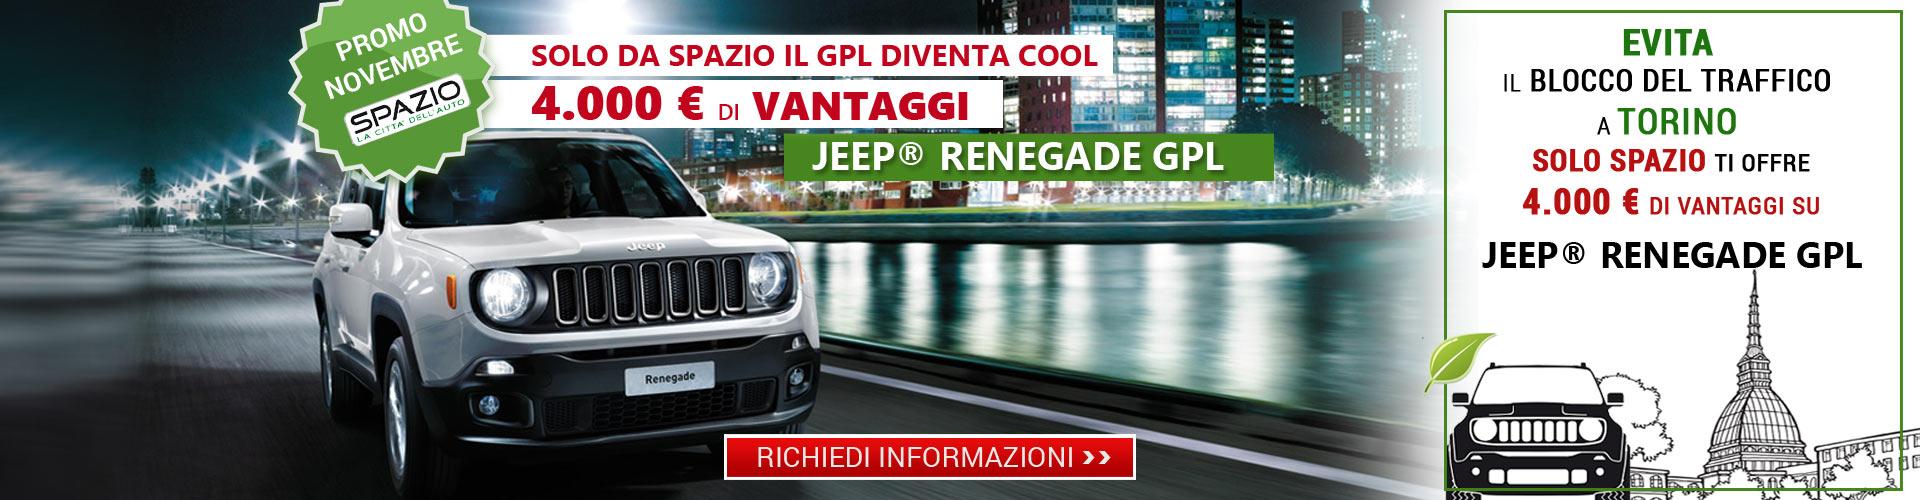 Jeep Reneagde GPL da Spazio a TORINO